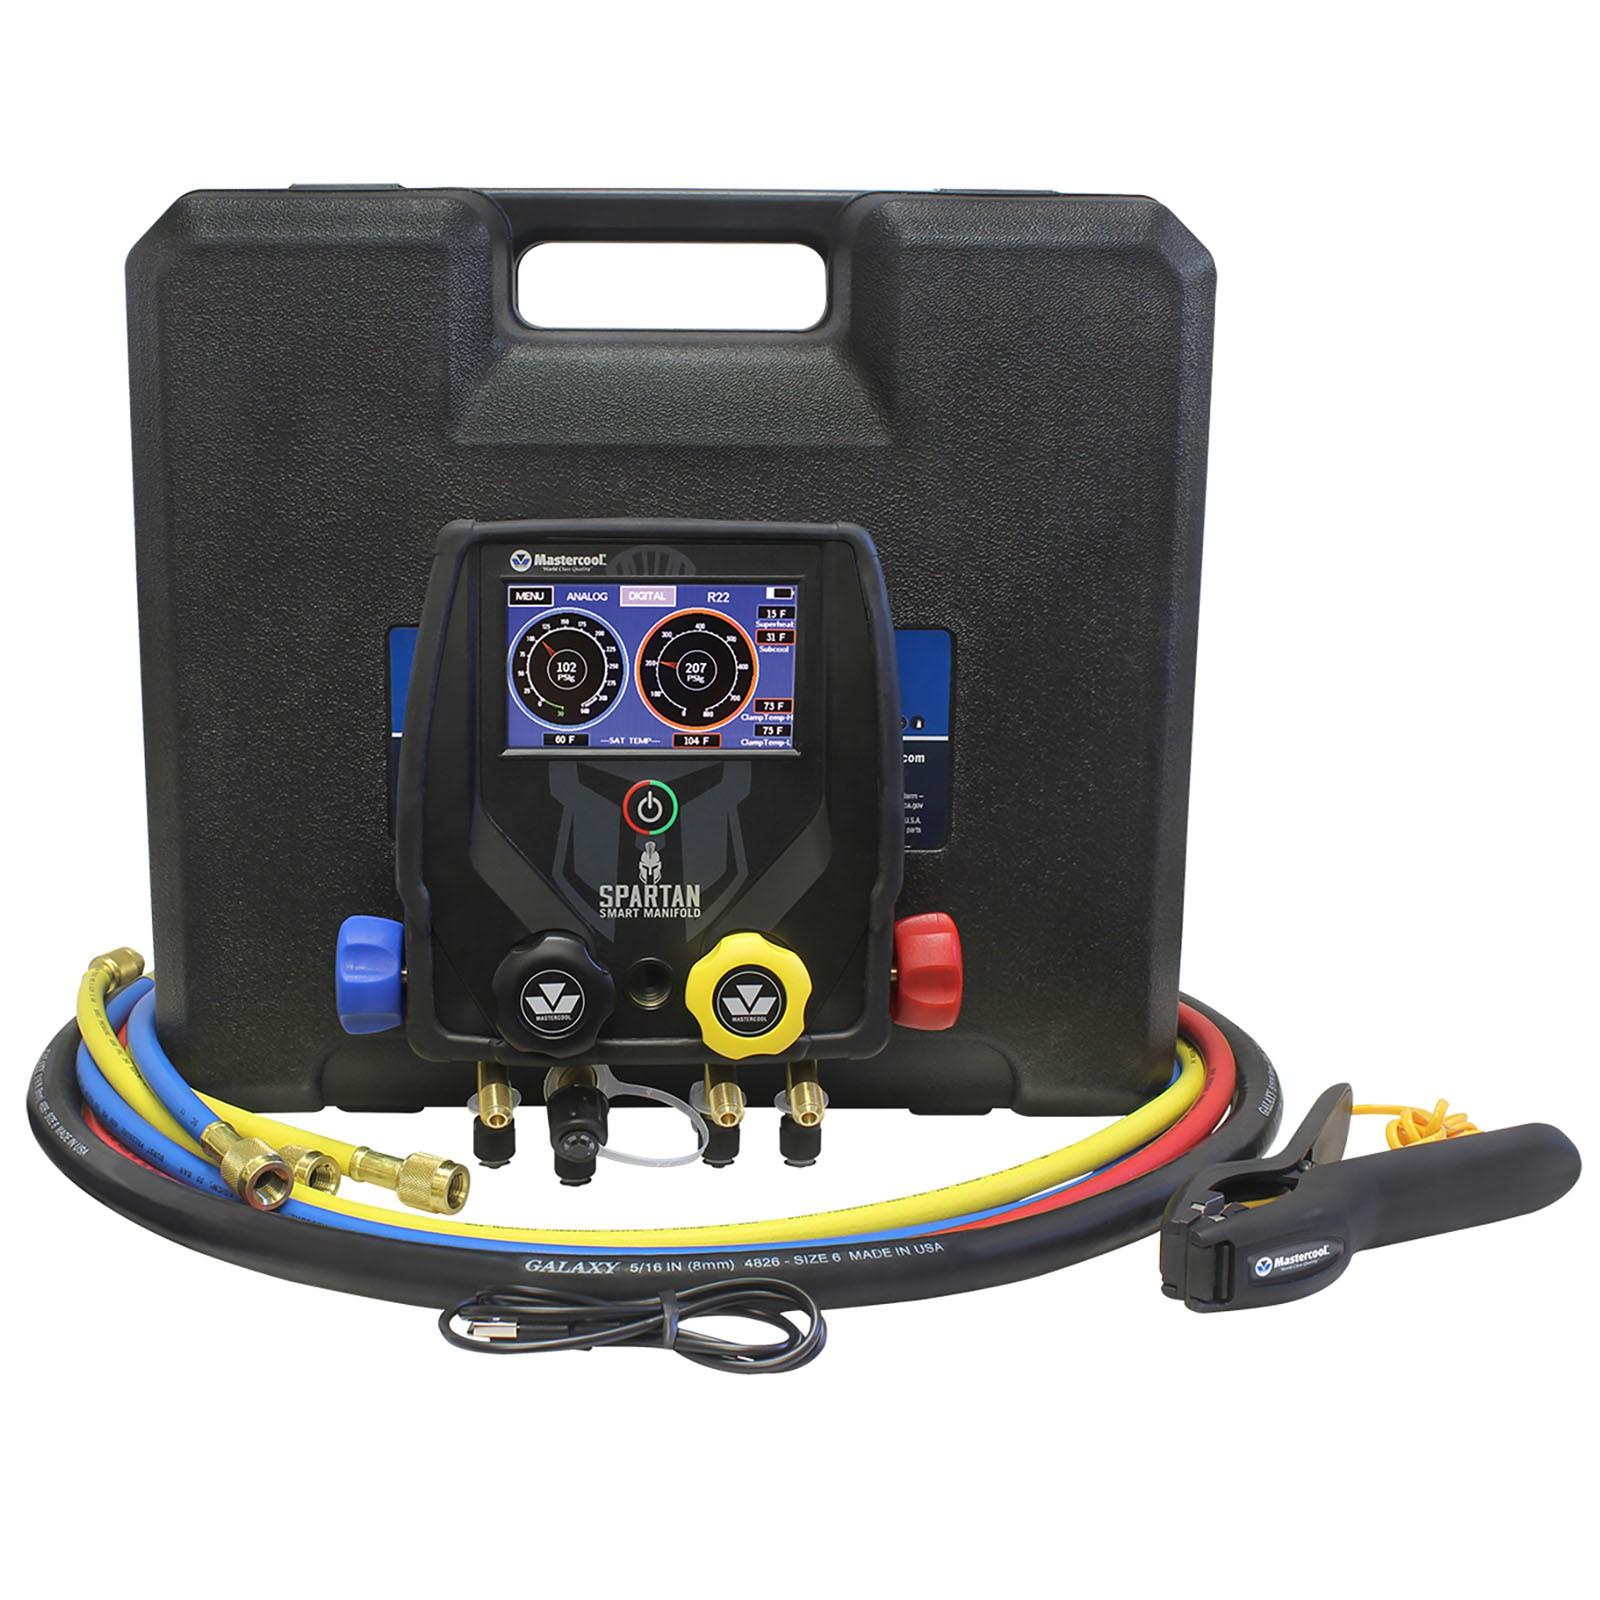 Manifold Digital Spartan 4 vias Vacuômetro Bluetooth 4 mangueiras MASTERCOOL 99946-BT-2